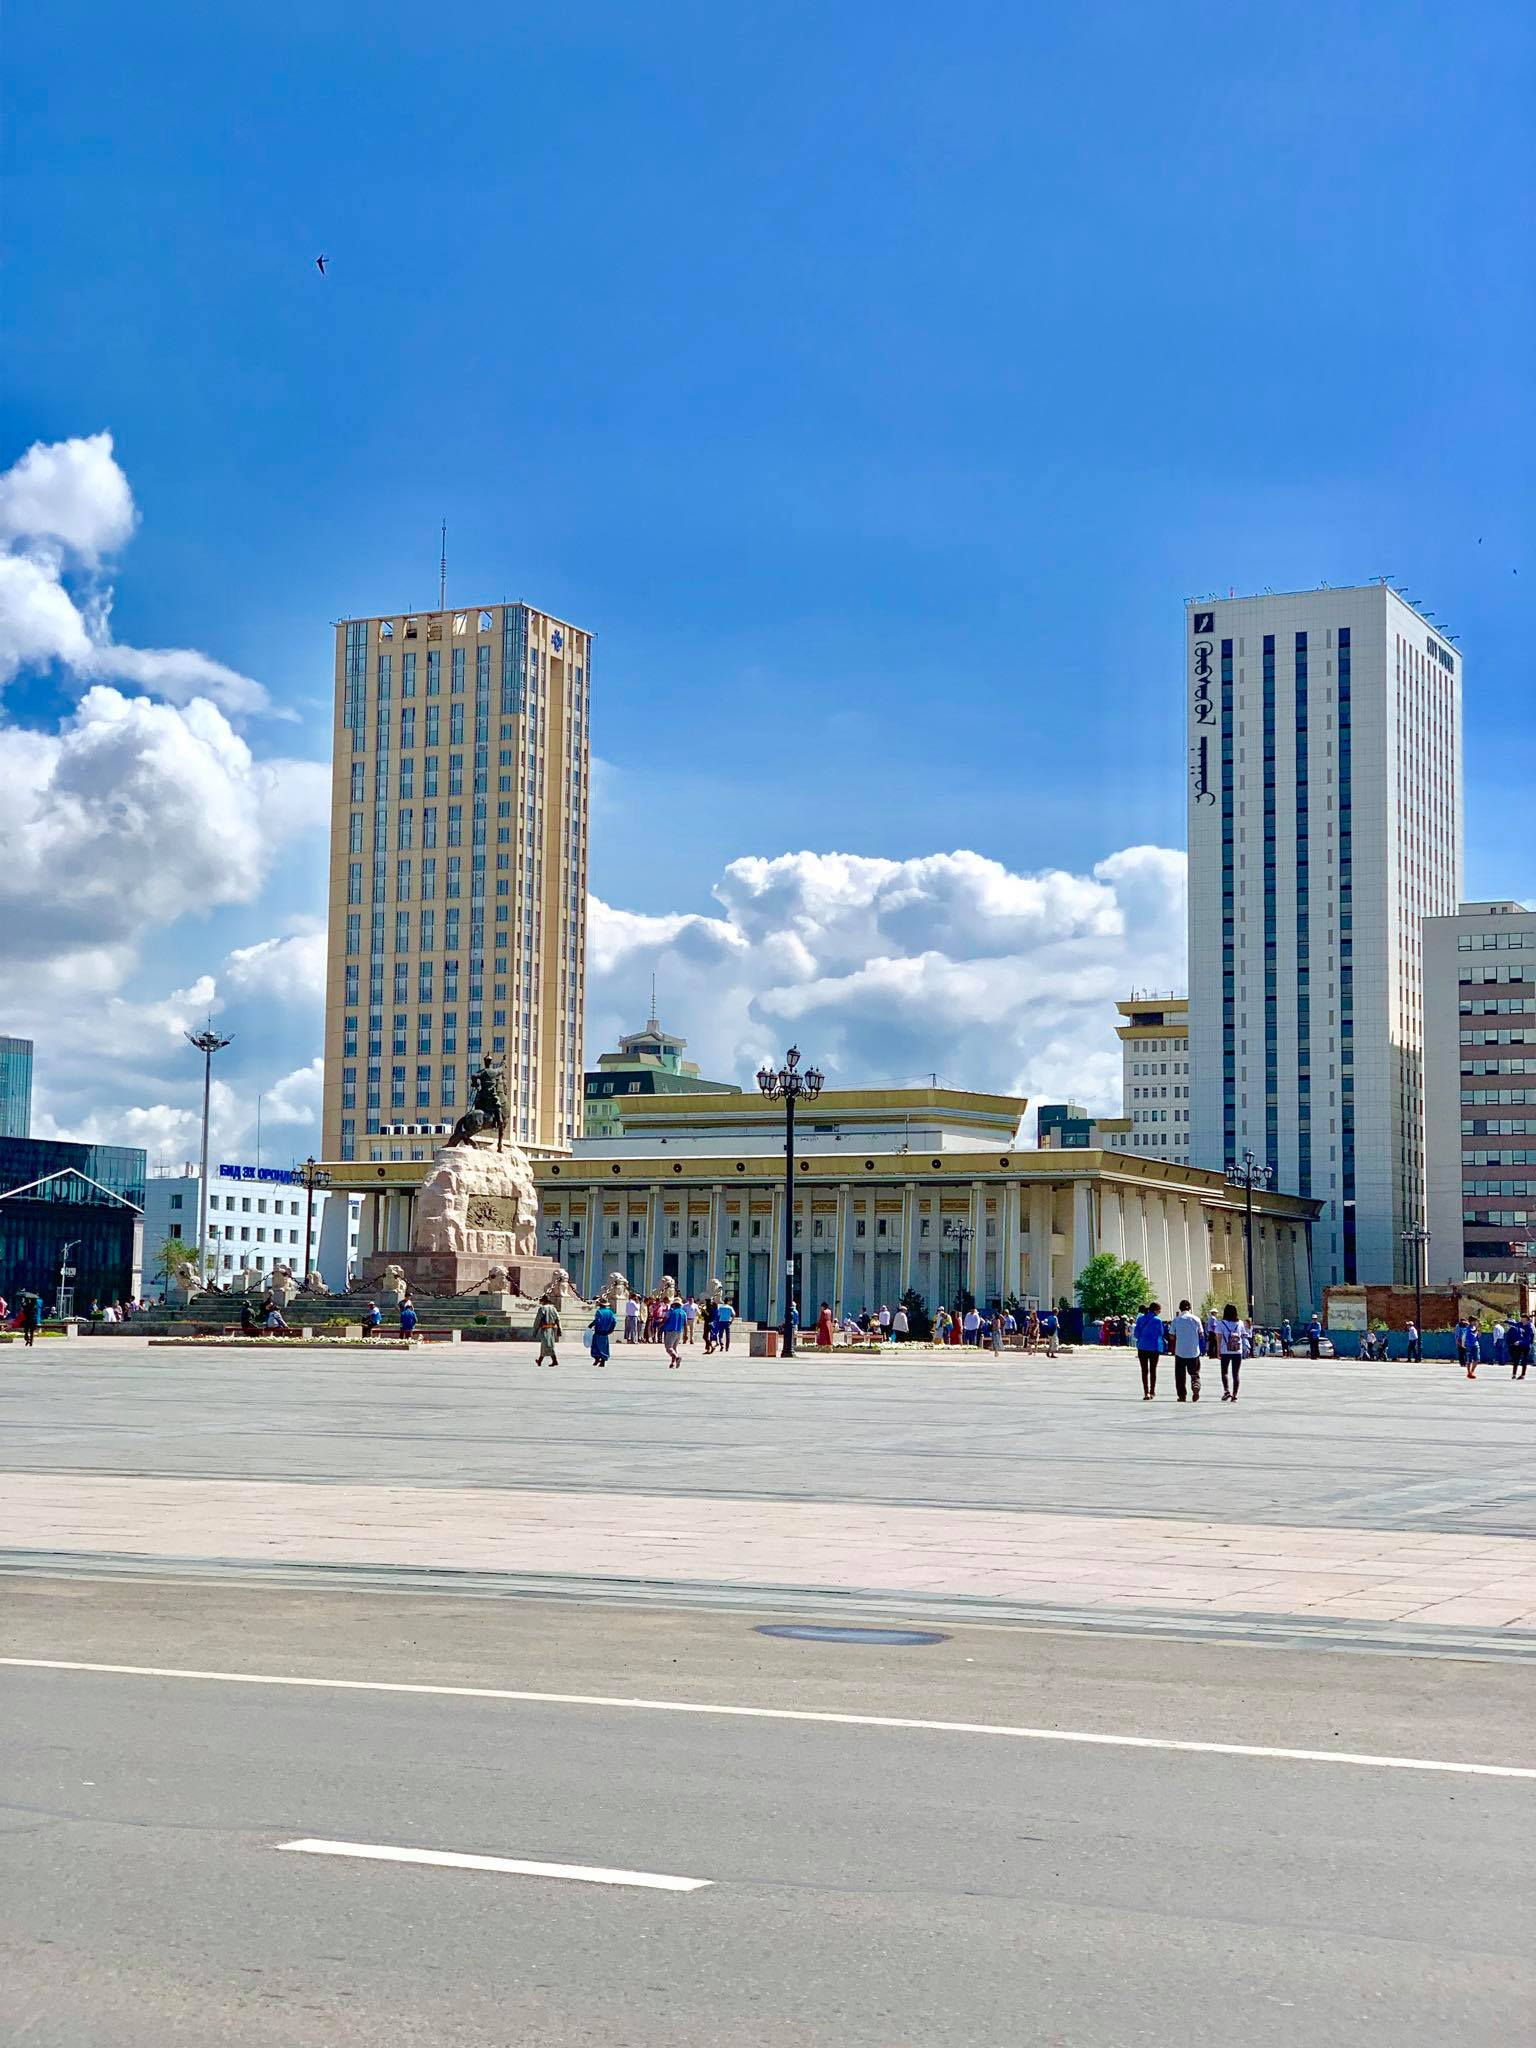 My Dream Trip To Mongolia